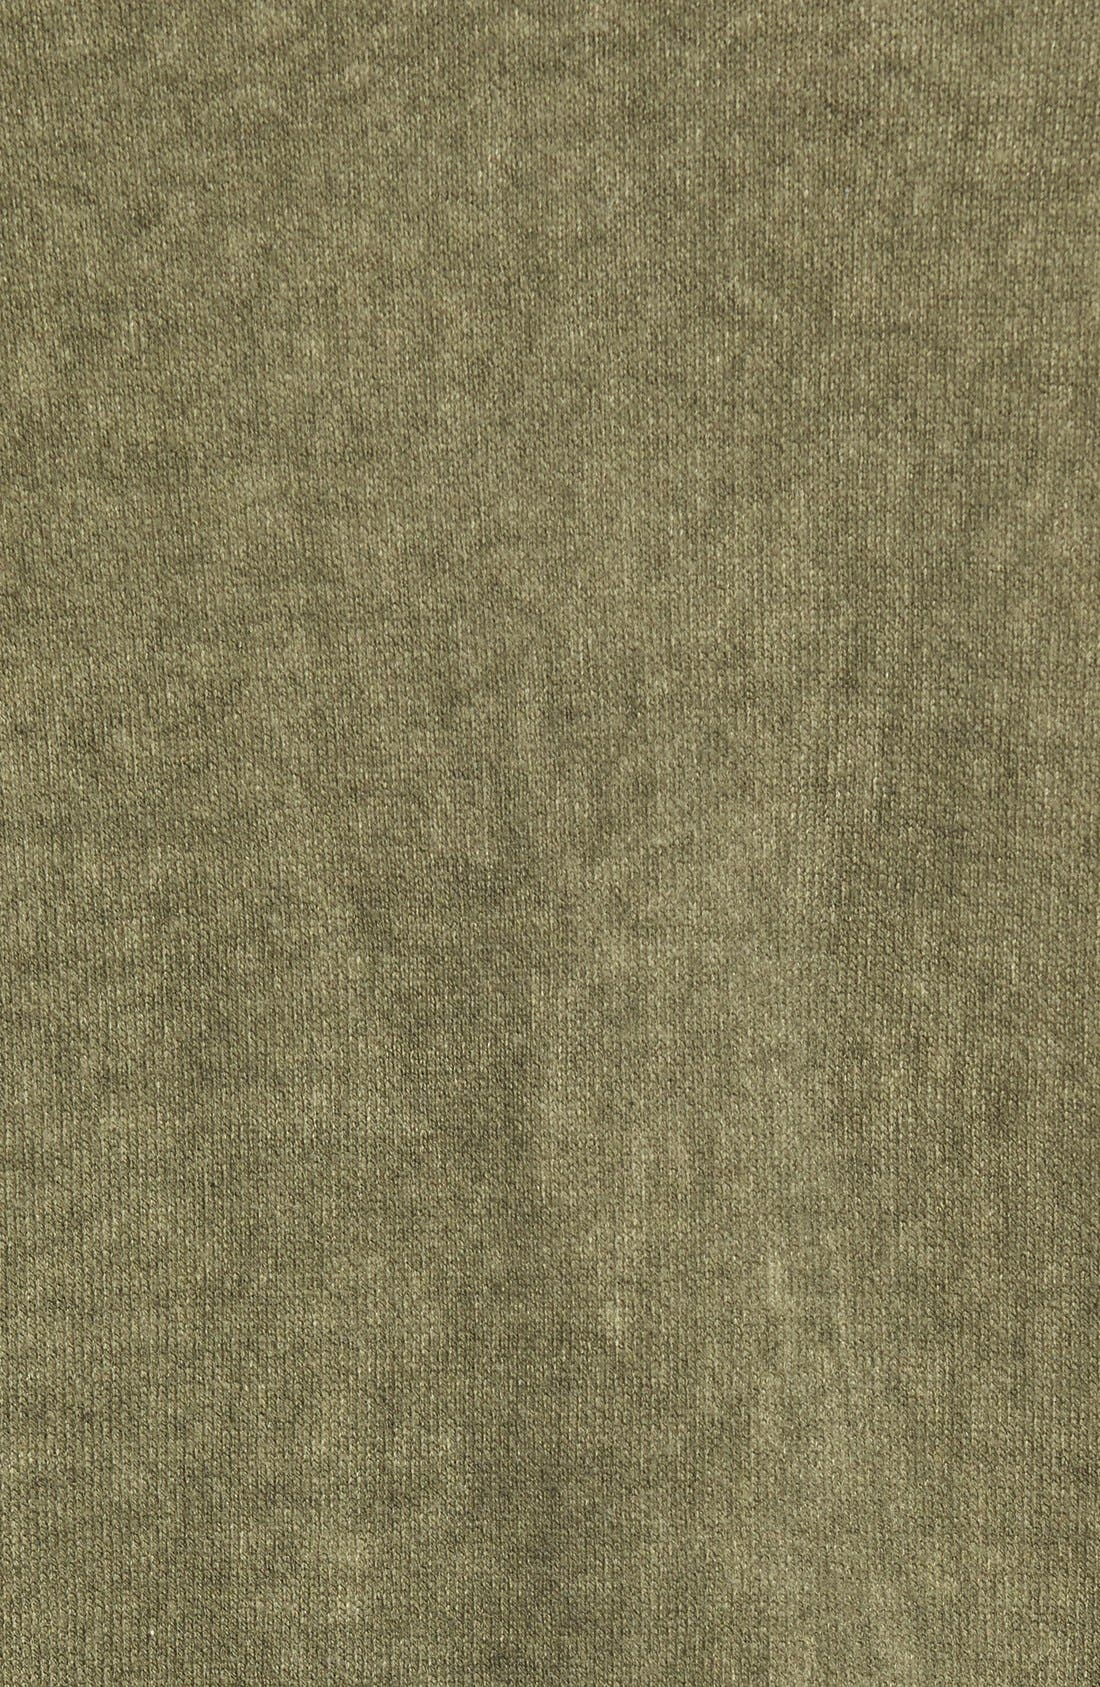 Mace Crewneck Sweater,                             Alternate thumbnail 5, color,